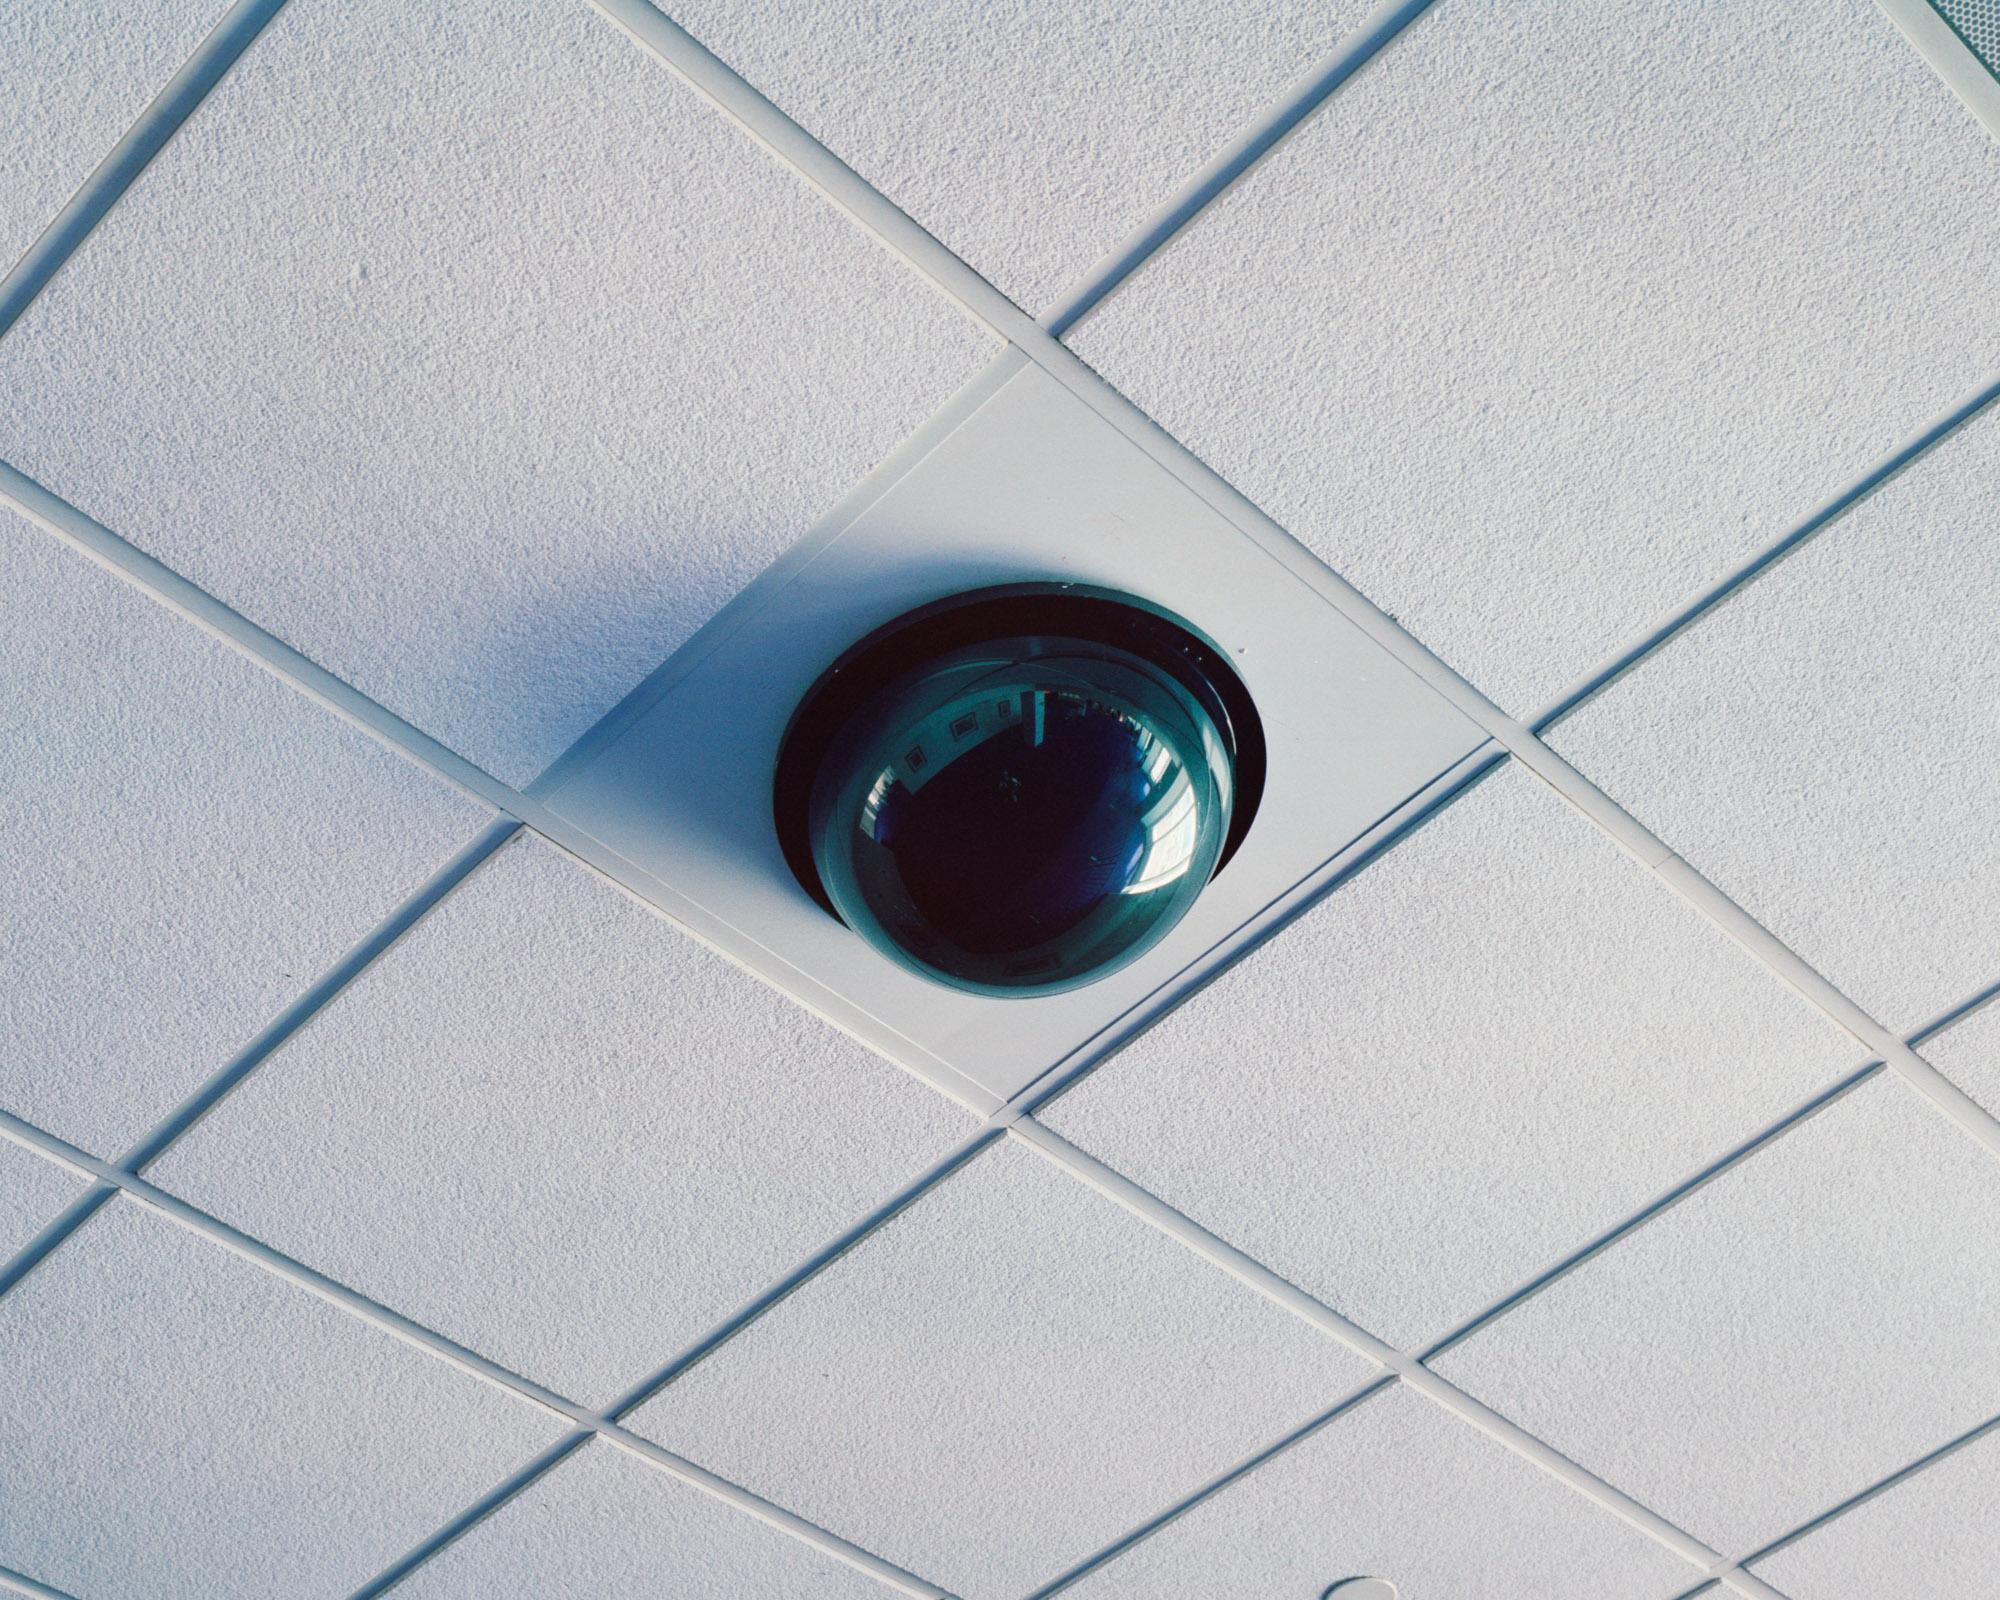 12_Resorts camera 2-.jpg